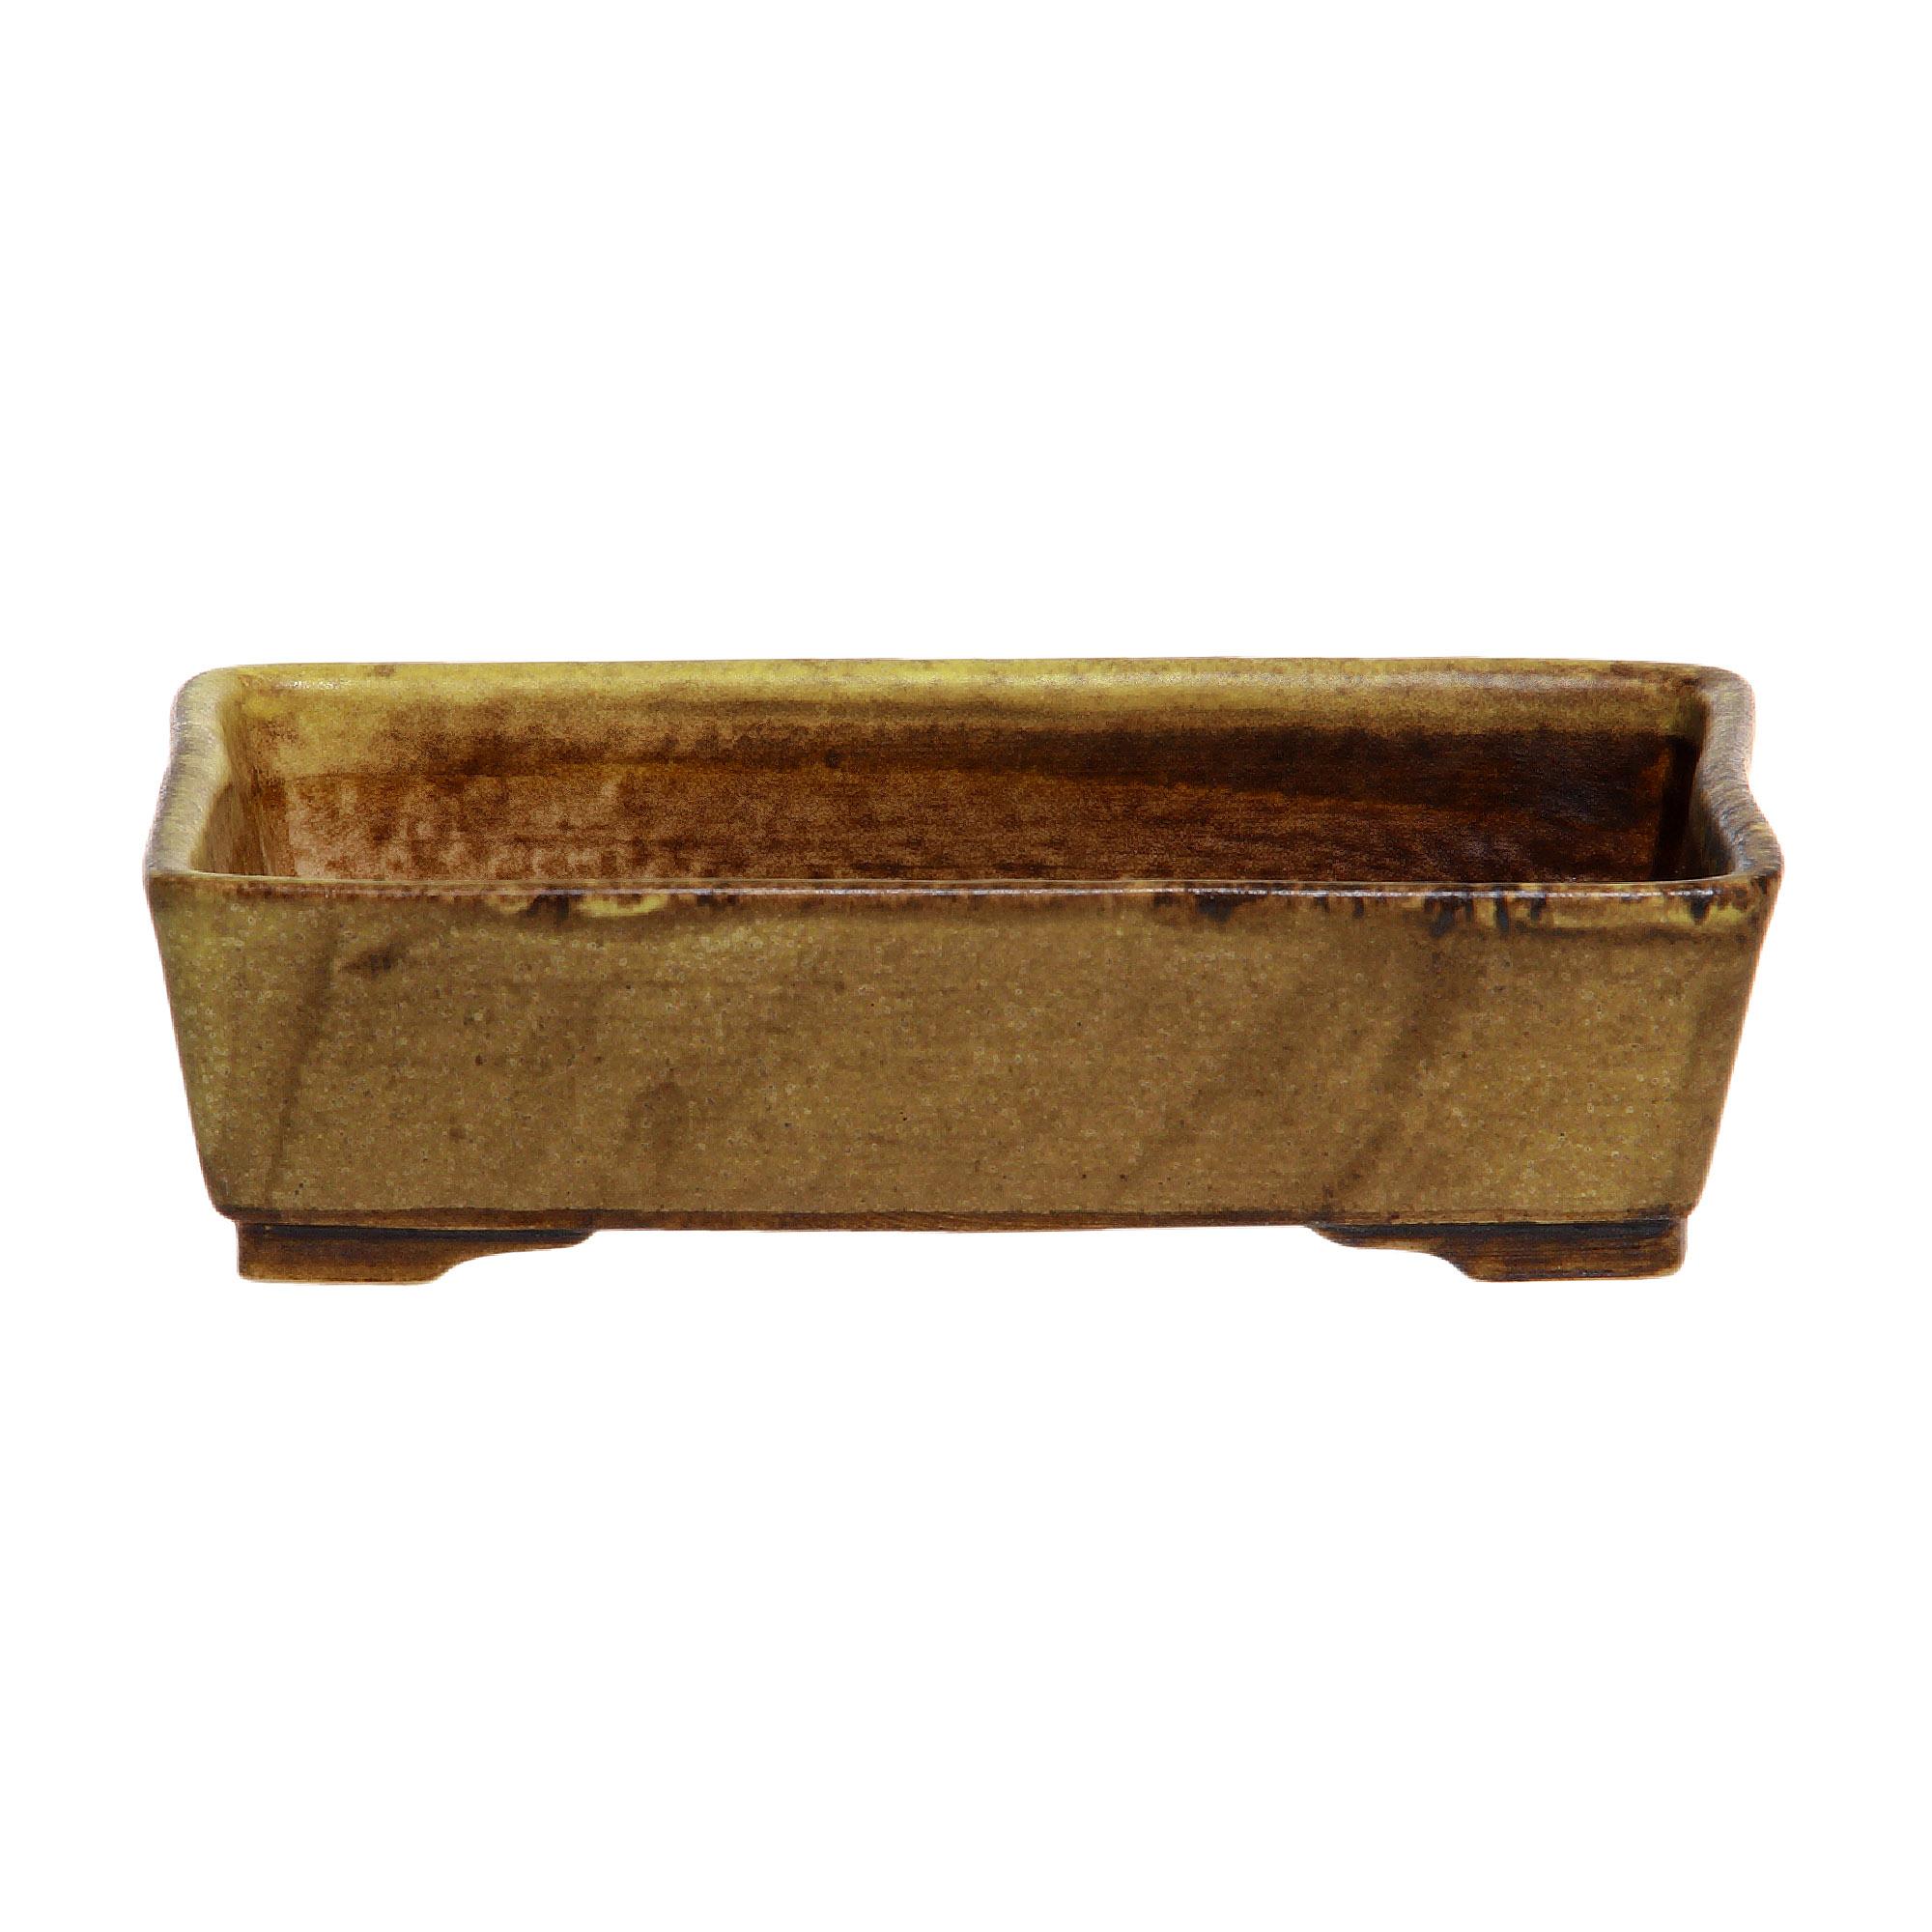 Кашпо Lodder ceram glazed rectangle №10 17x12x4 см